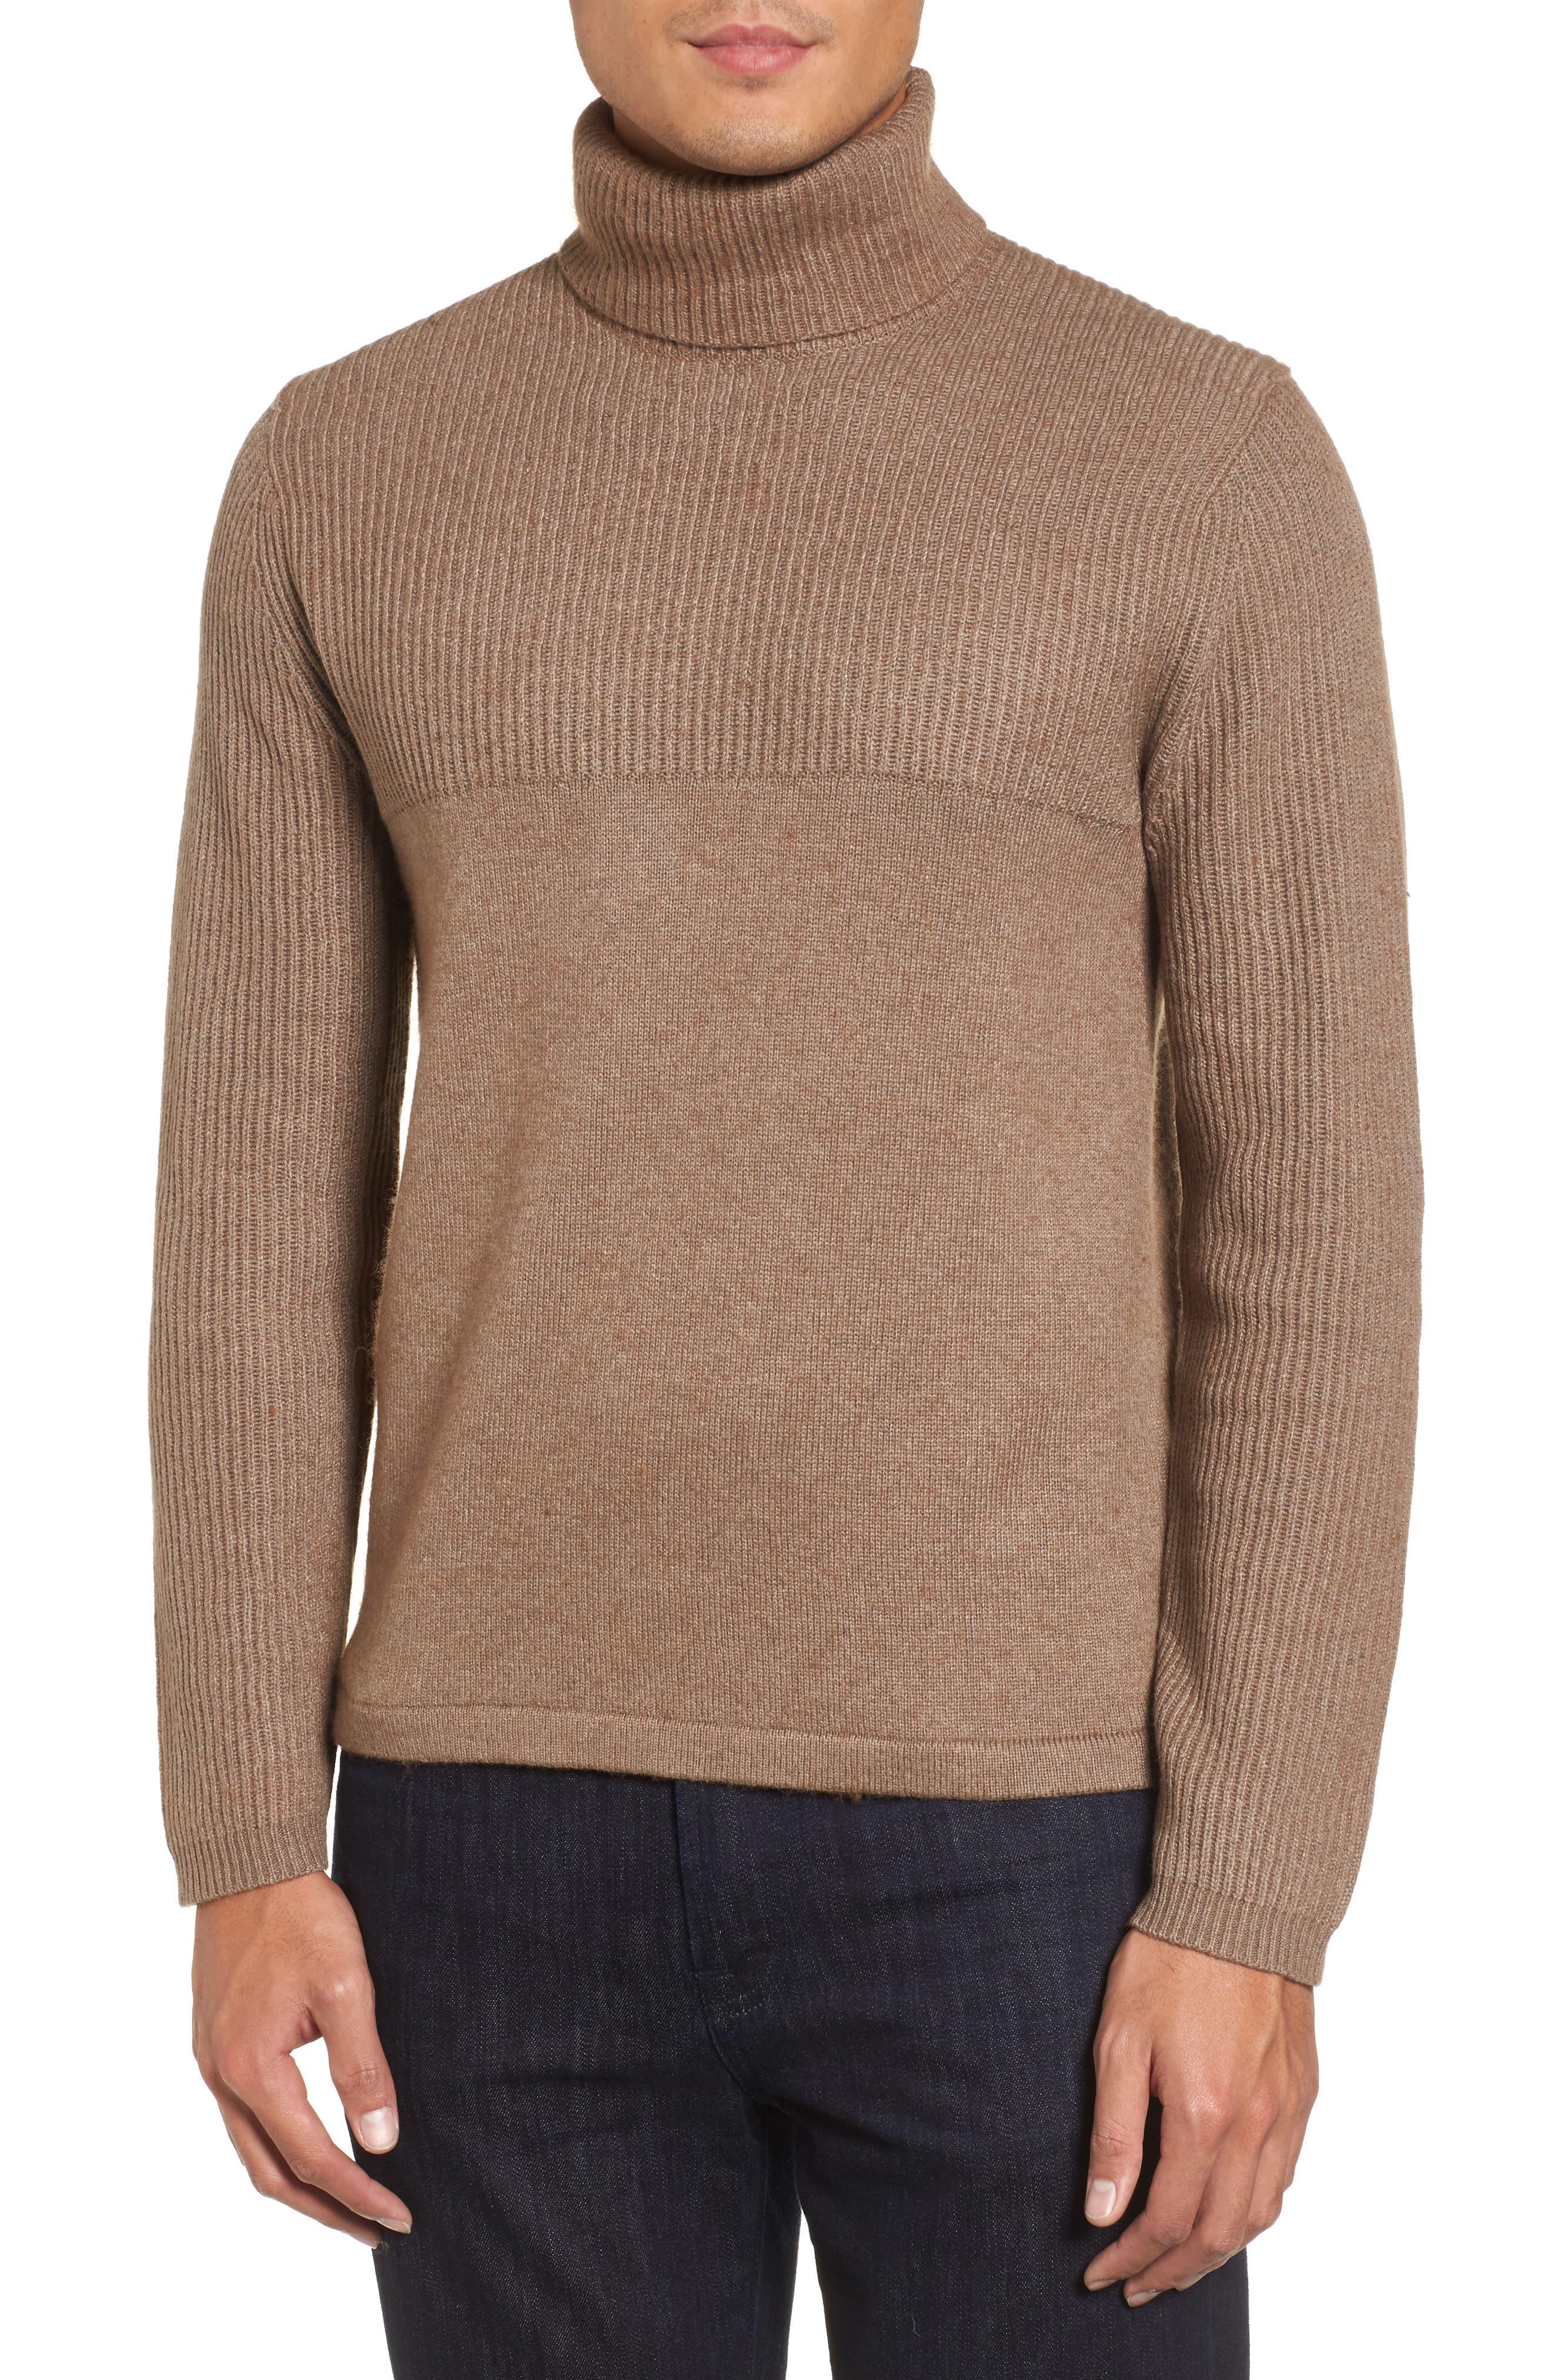 Mix Stitch Turtleneck Sweater,                         Main,                         color, 261